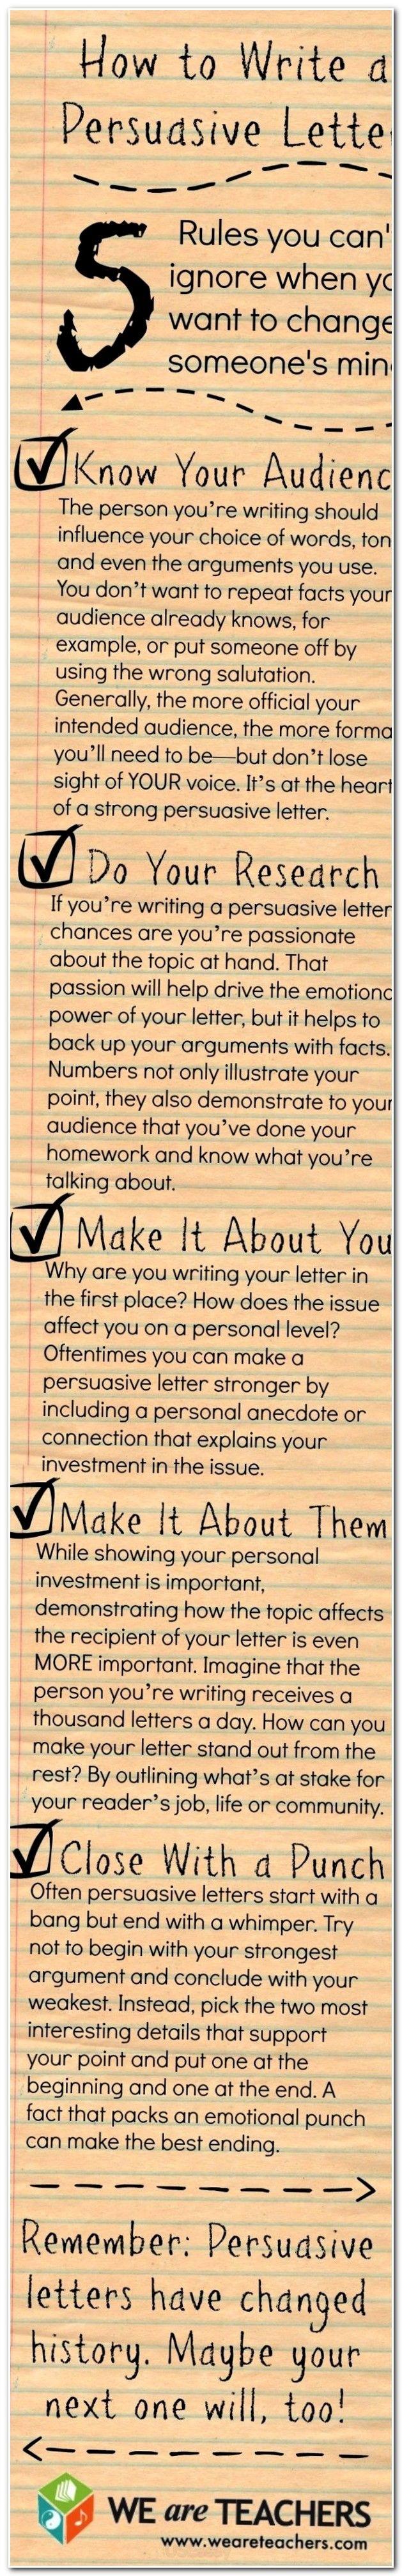 essay essaywriting middle school essay contest topics for essay essaywriting middle school essay contest topics for business research papers arguments expository